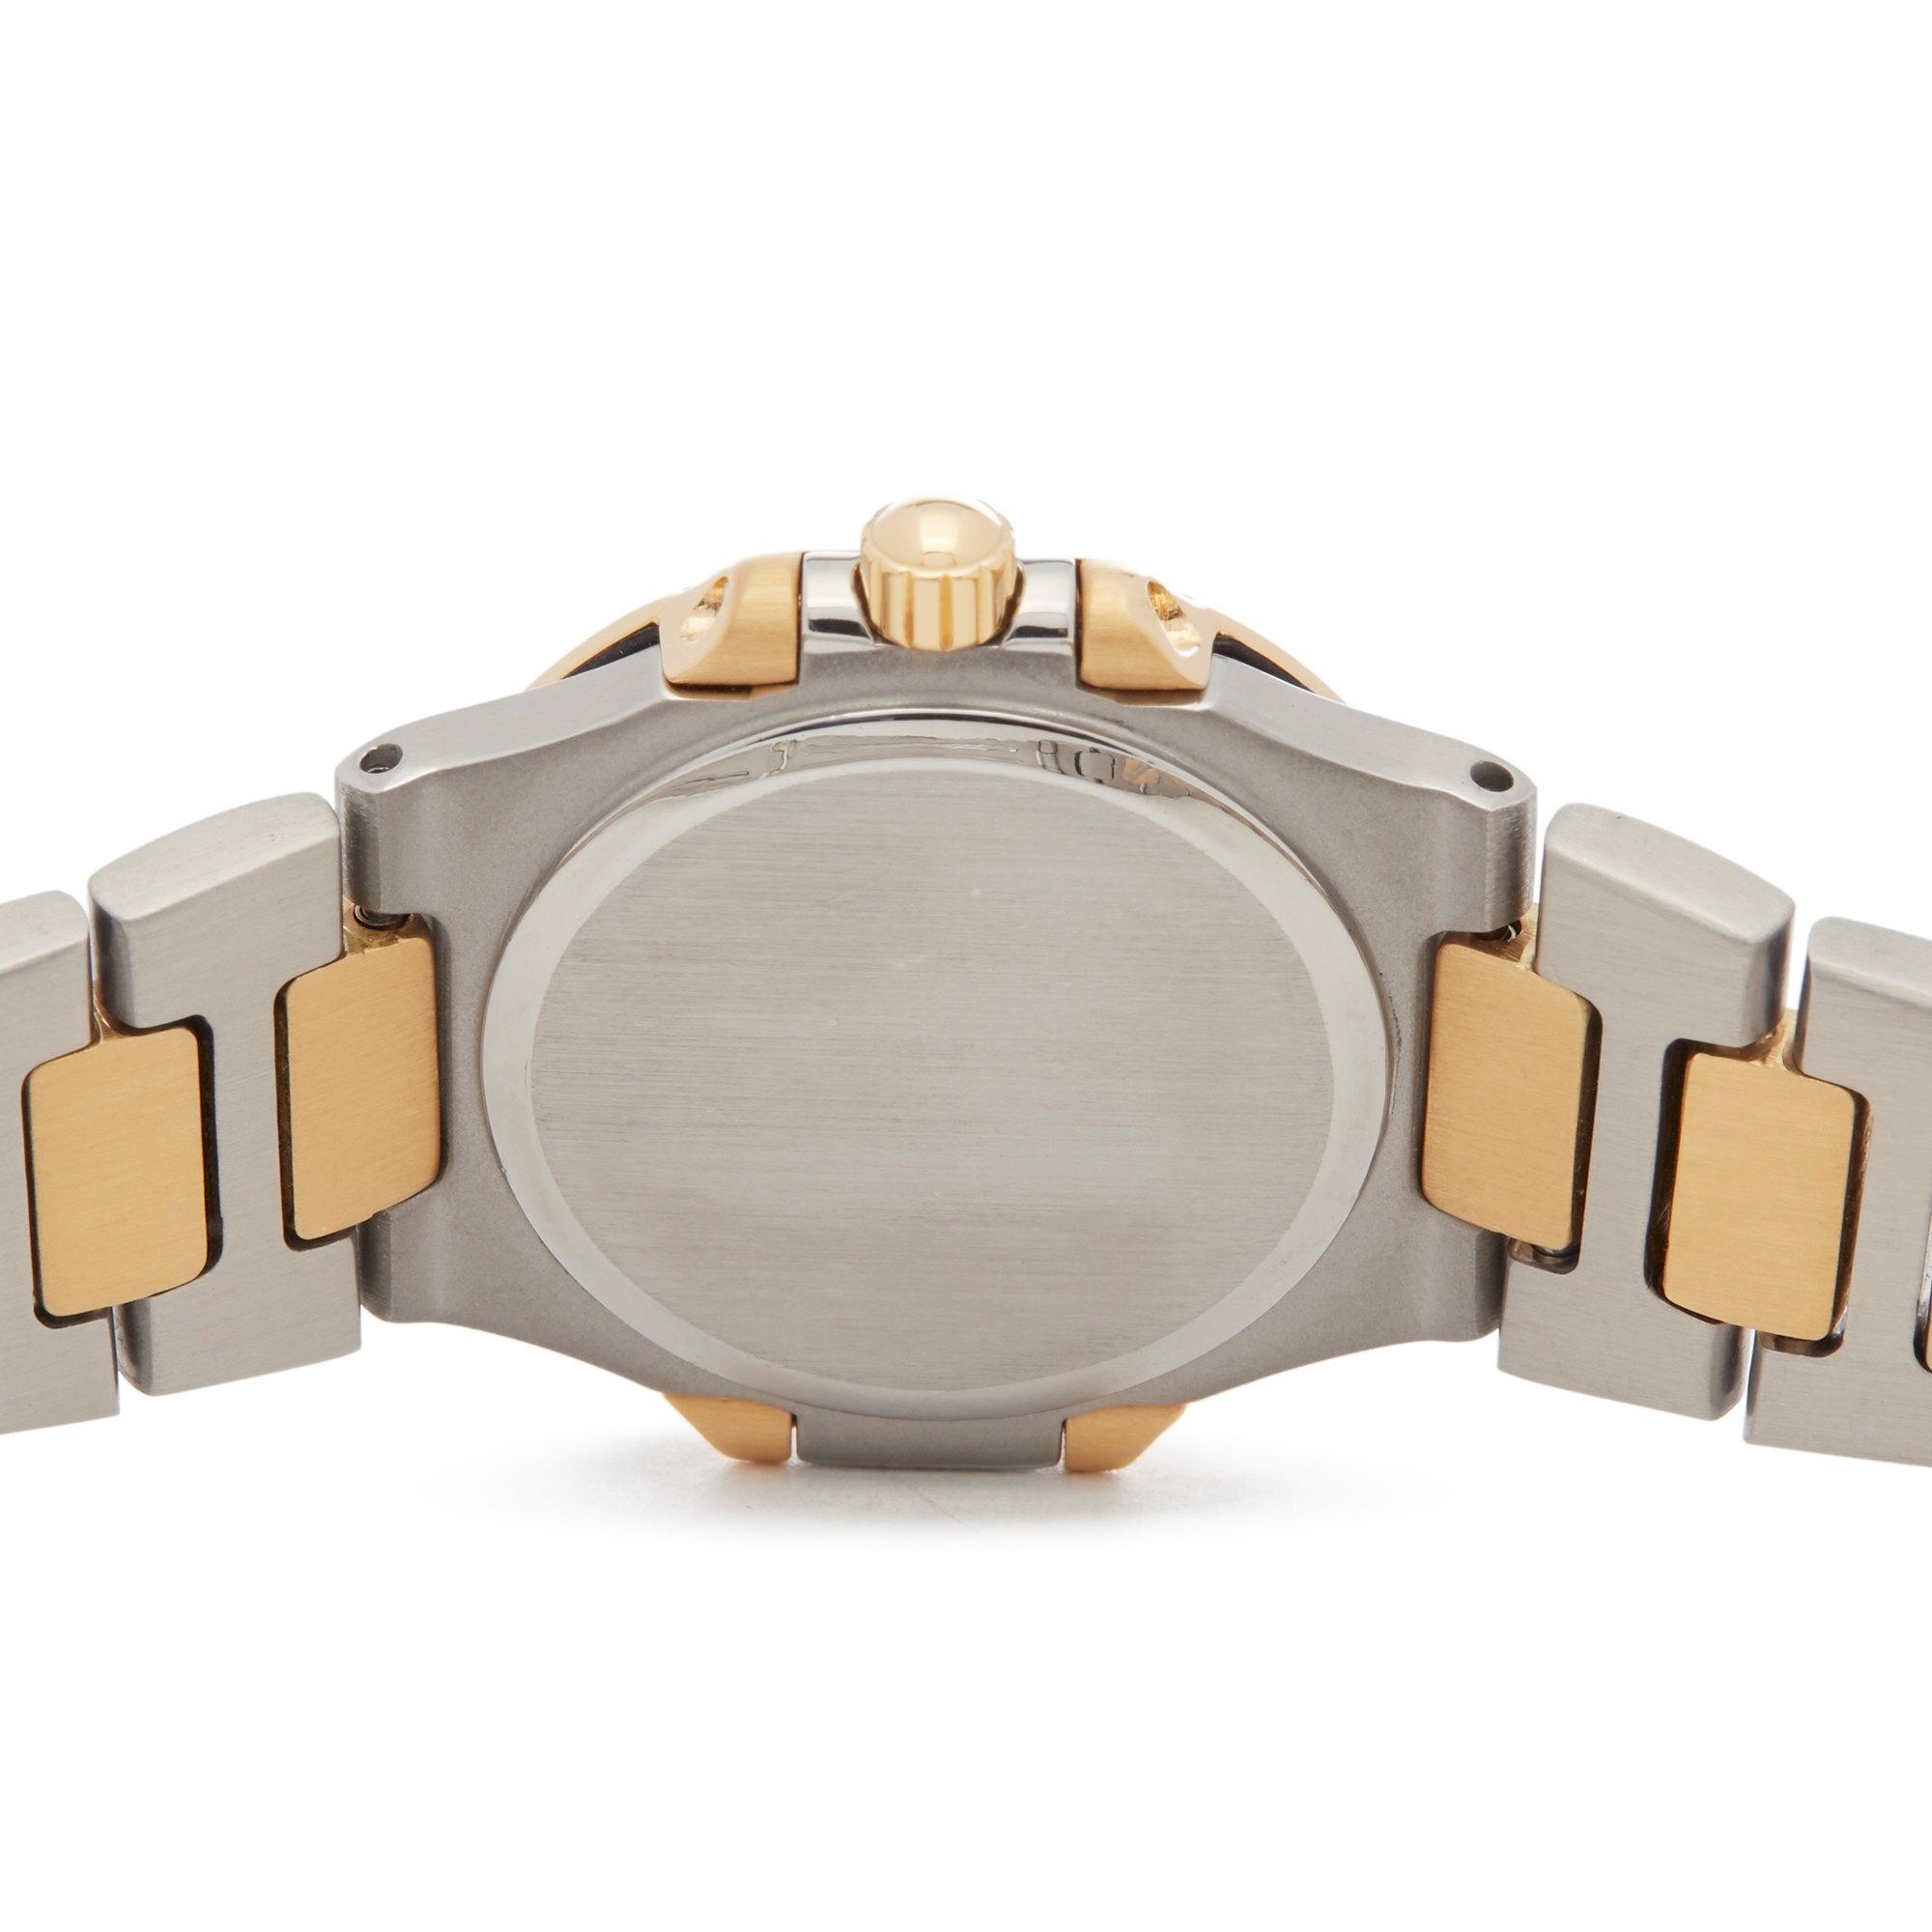 Patek Philippe Nautilus Stainless Steel & Yellow Gold 4700